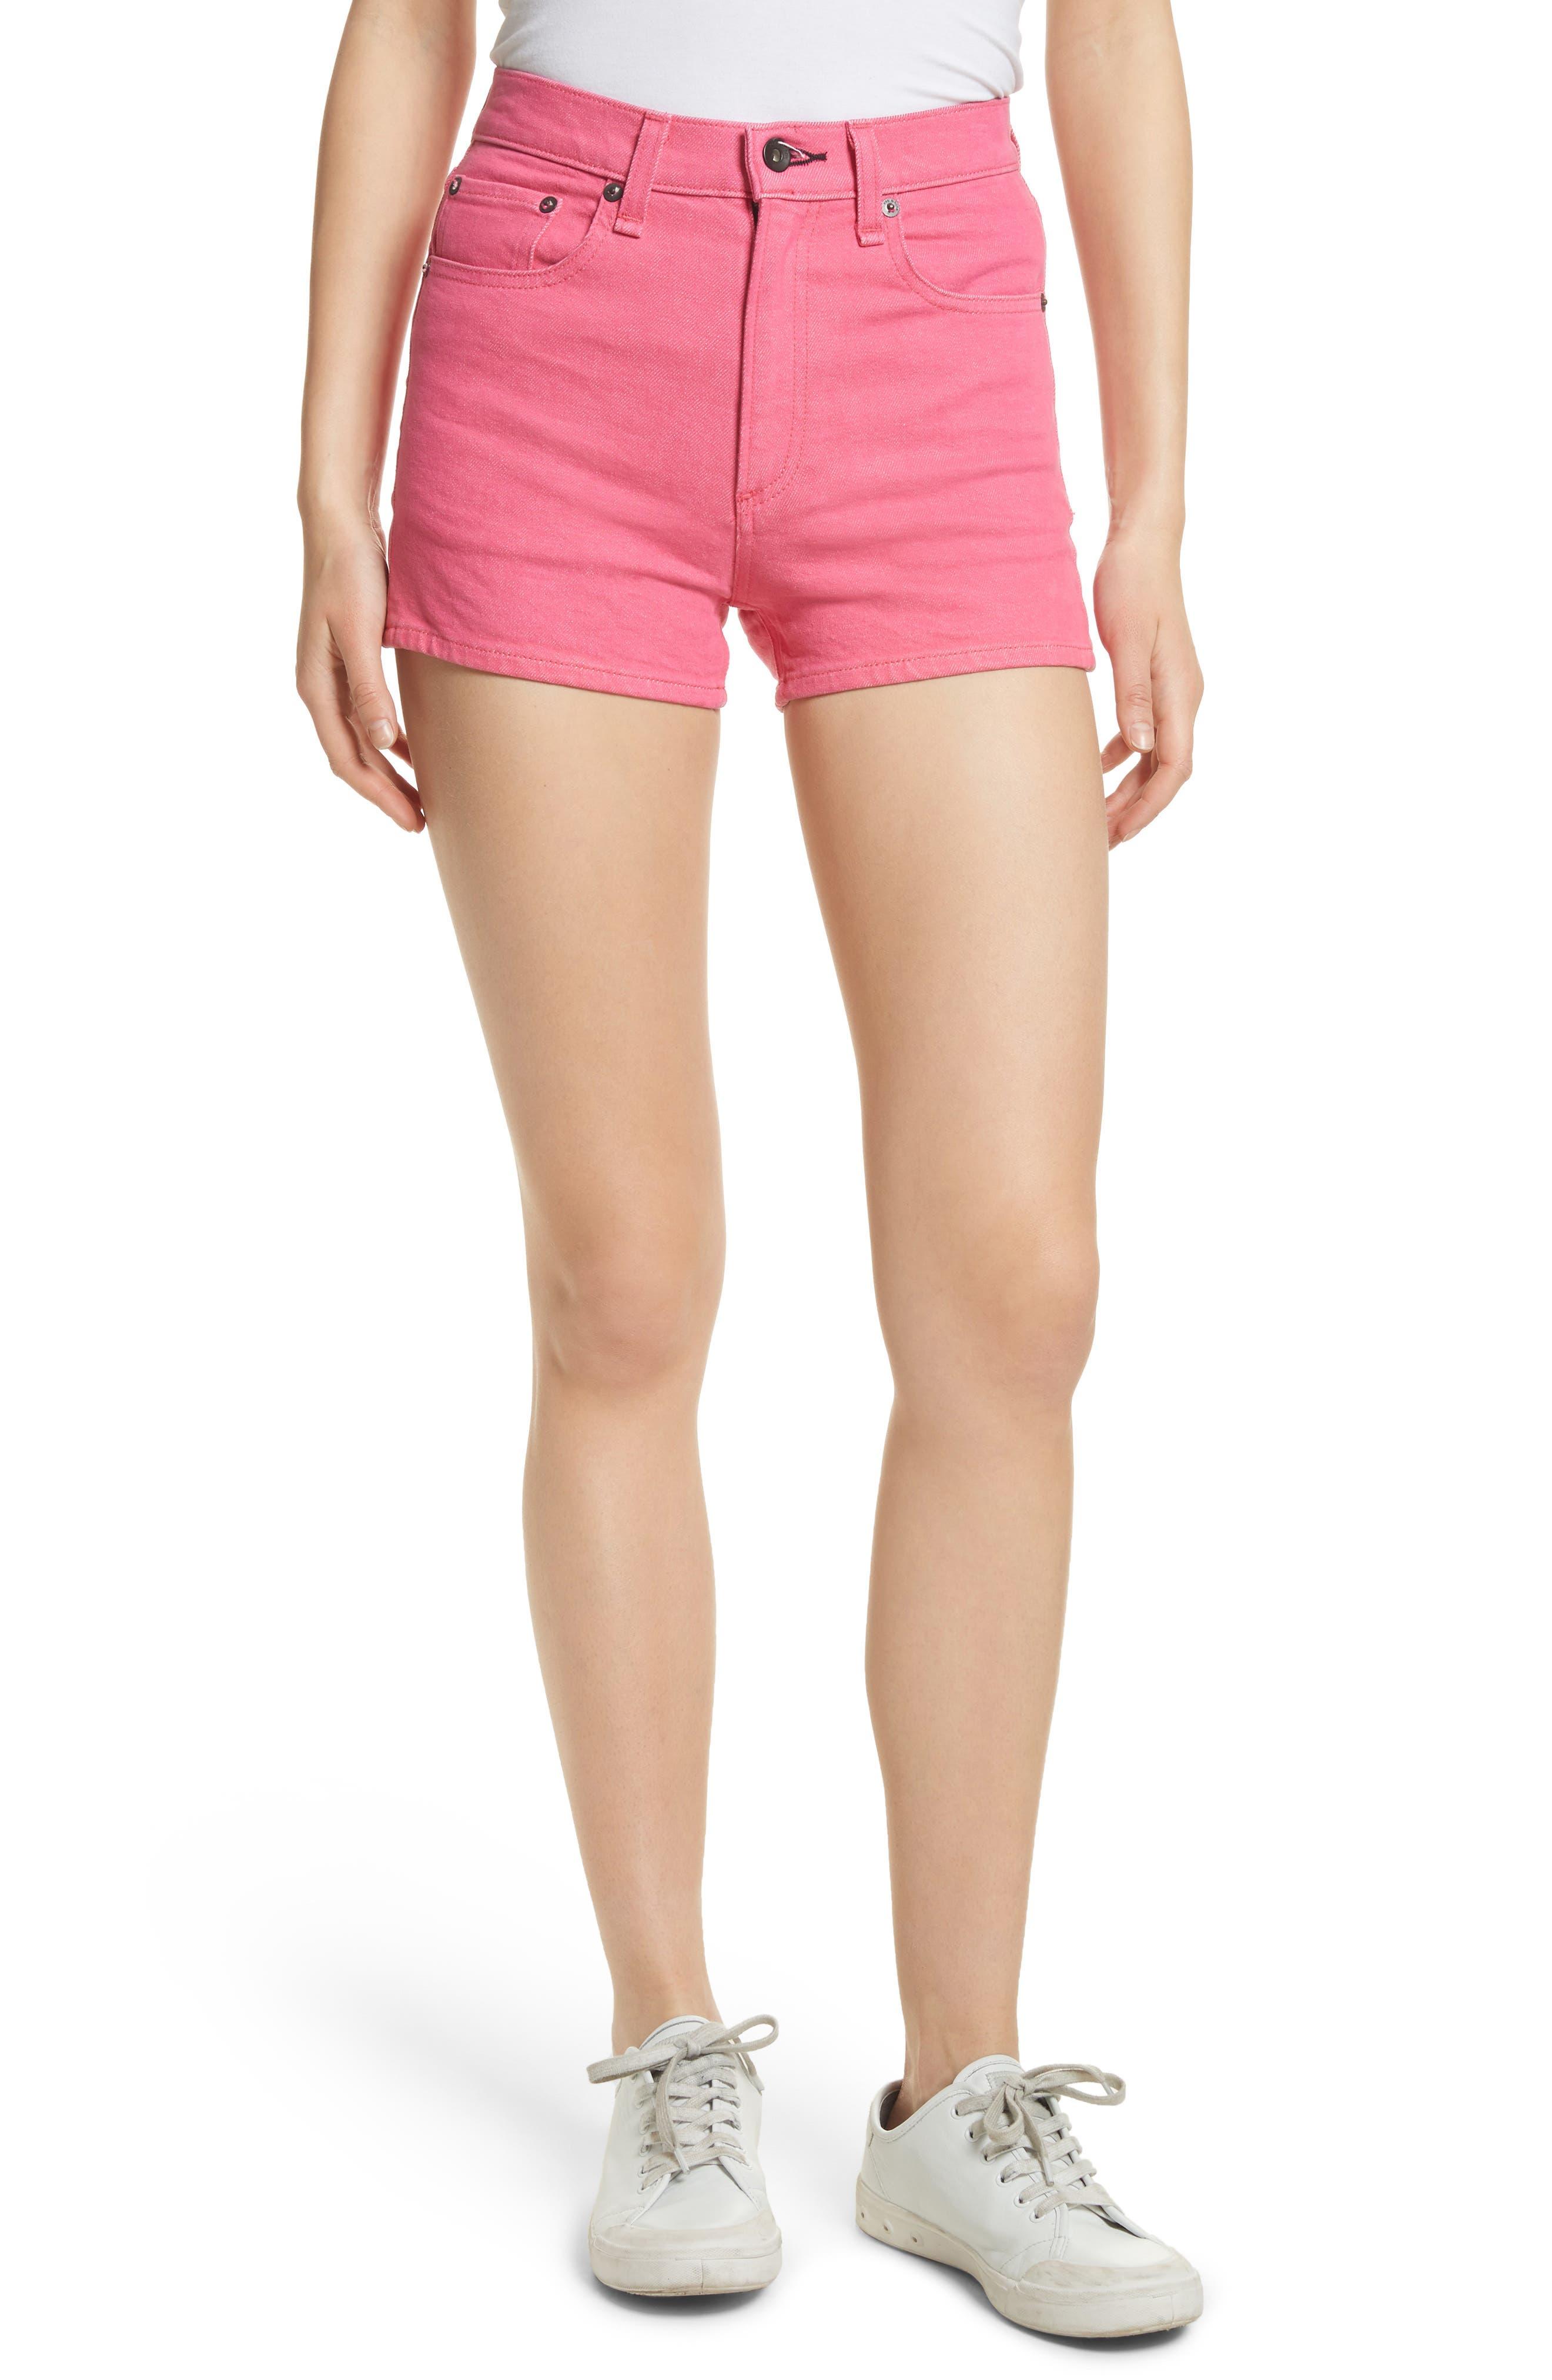 Justine High Waist Denim Shorts,                             Main thumbnail 1, color,                             Bull Pink